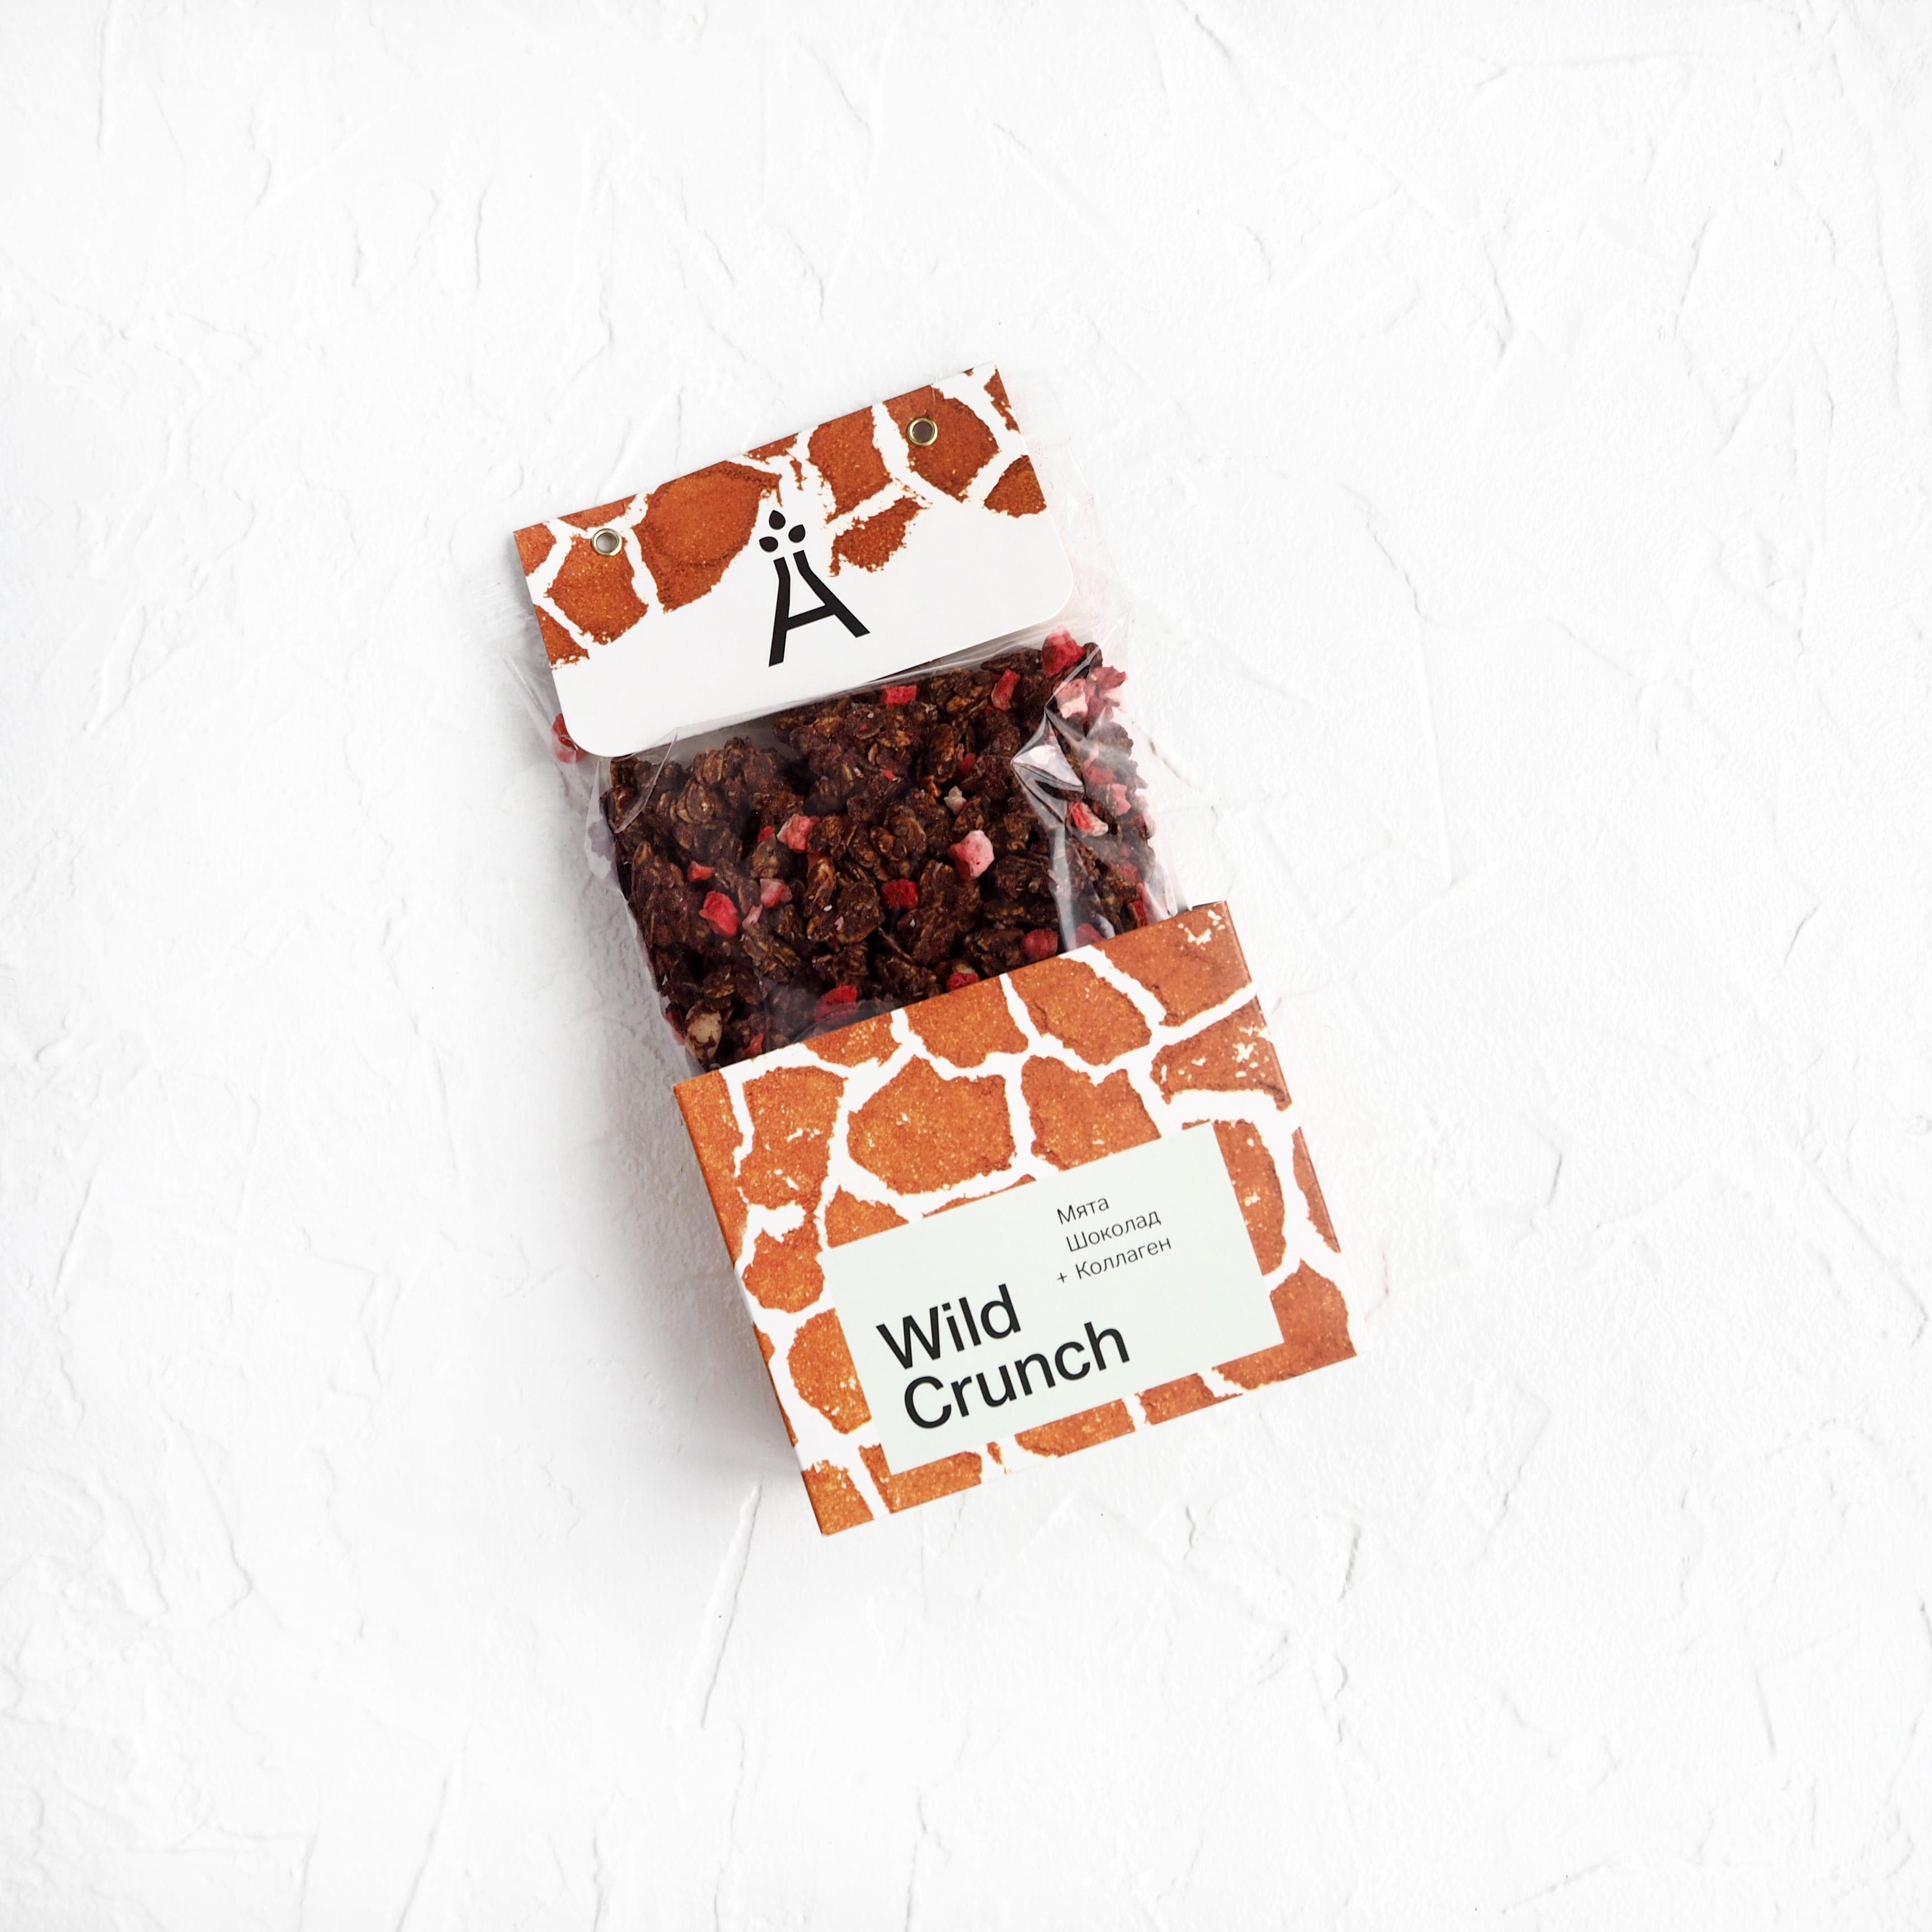 Wild Crunch Мята и шоколад (260 г)